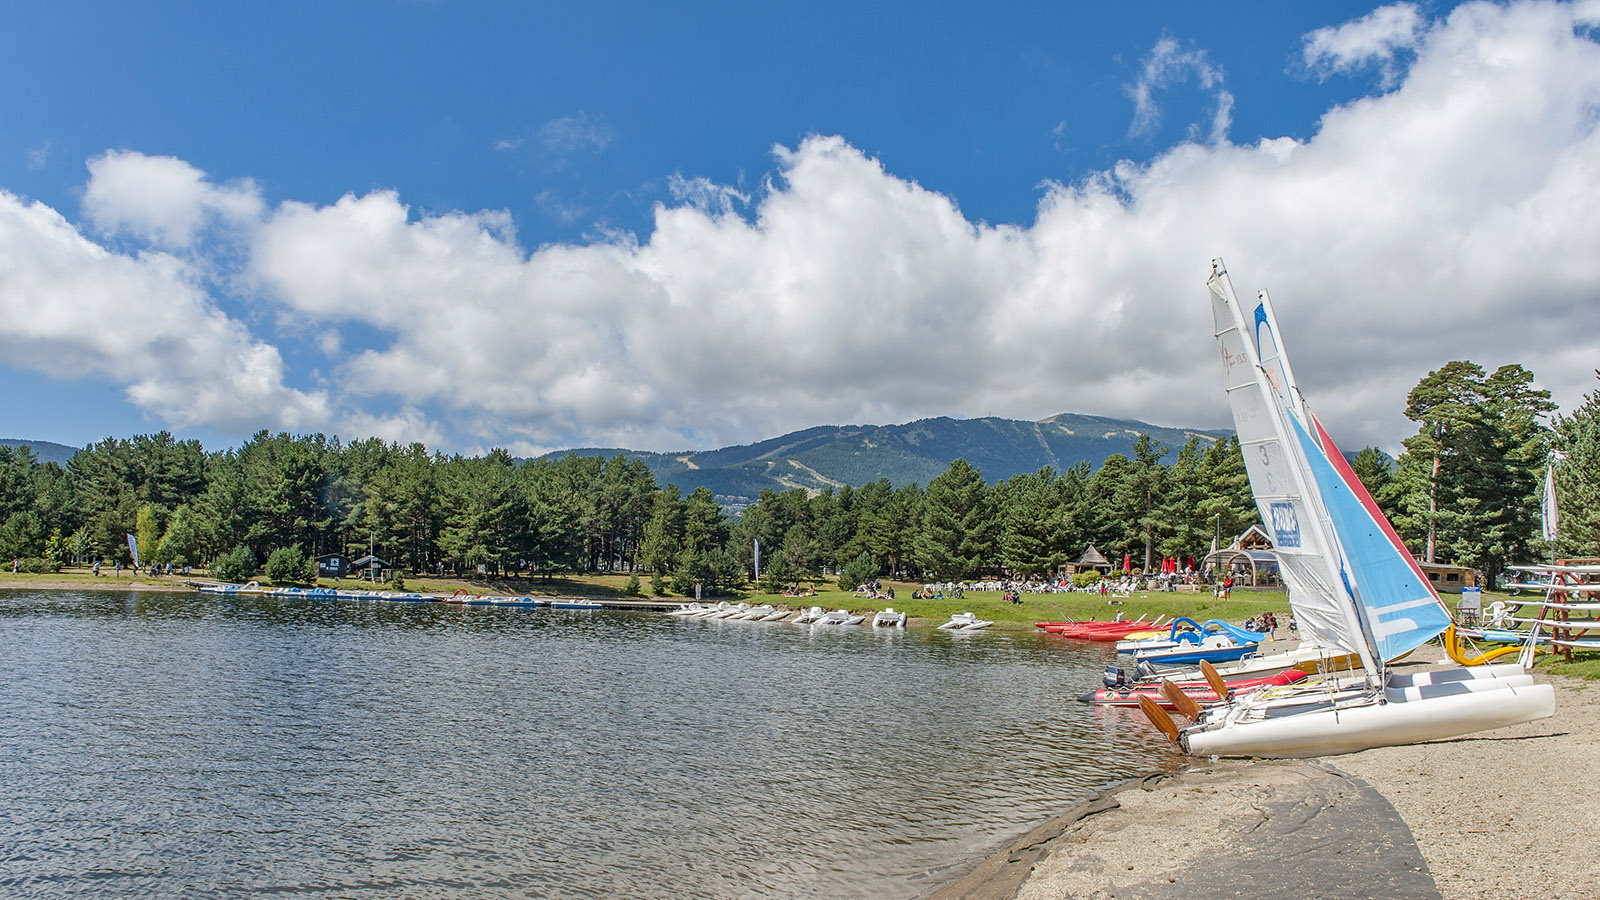 Capcir: Der Lac de Matemale begeistert Wassersportler wie Badenixen. Foto: Hilke Maunder